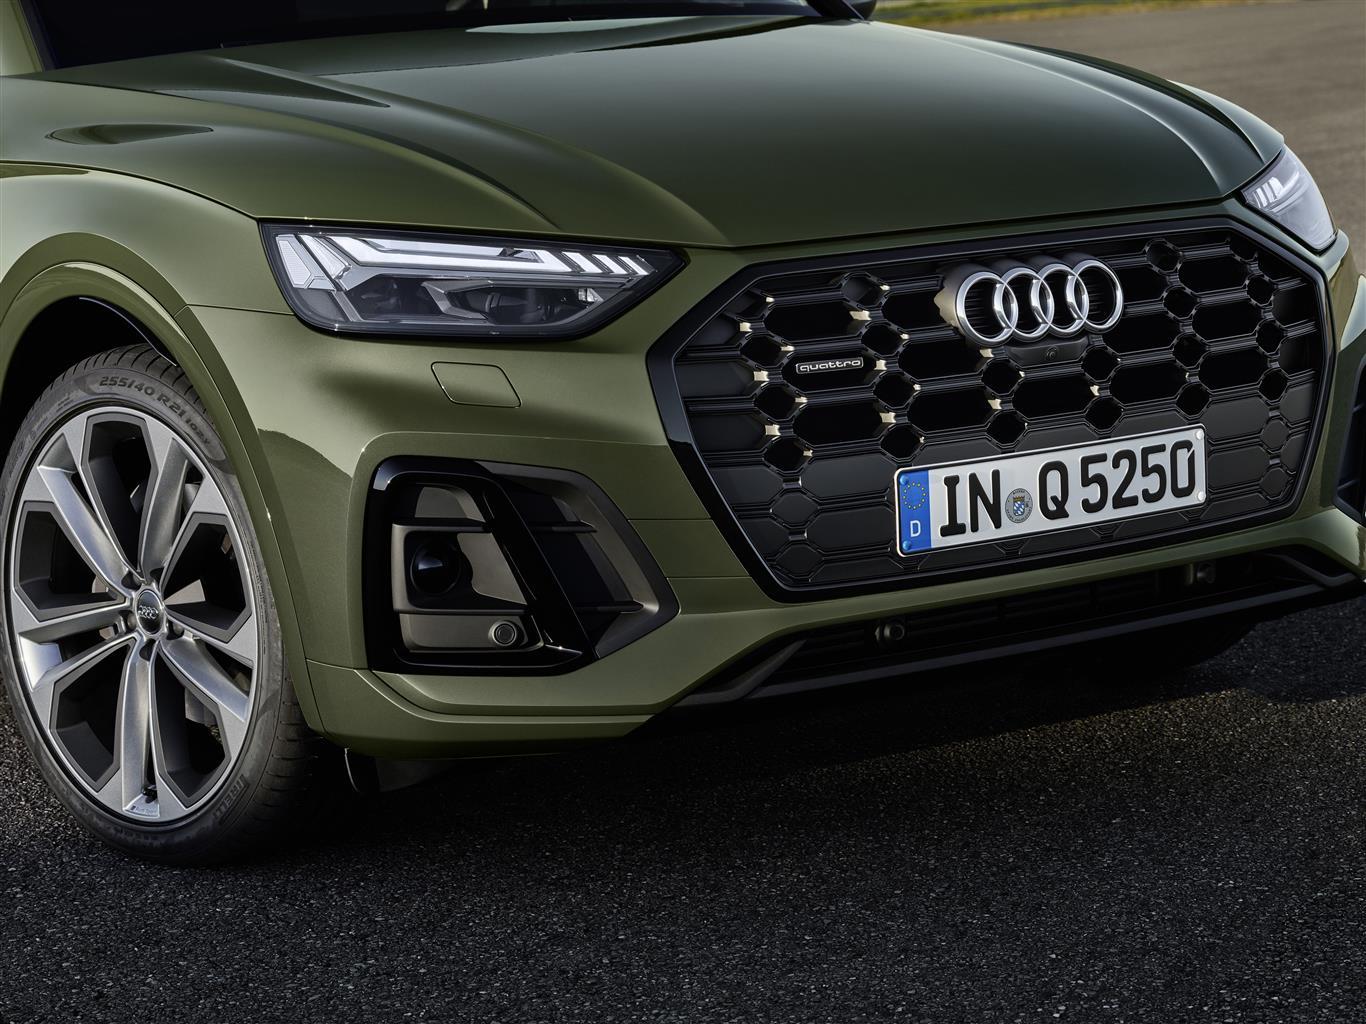 Nuova Audi Q5 frontale